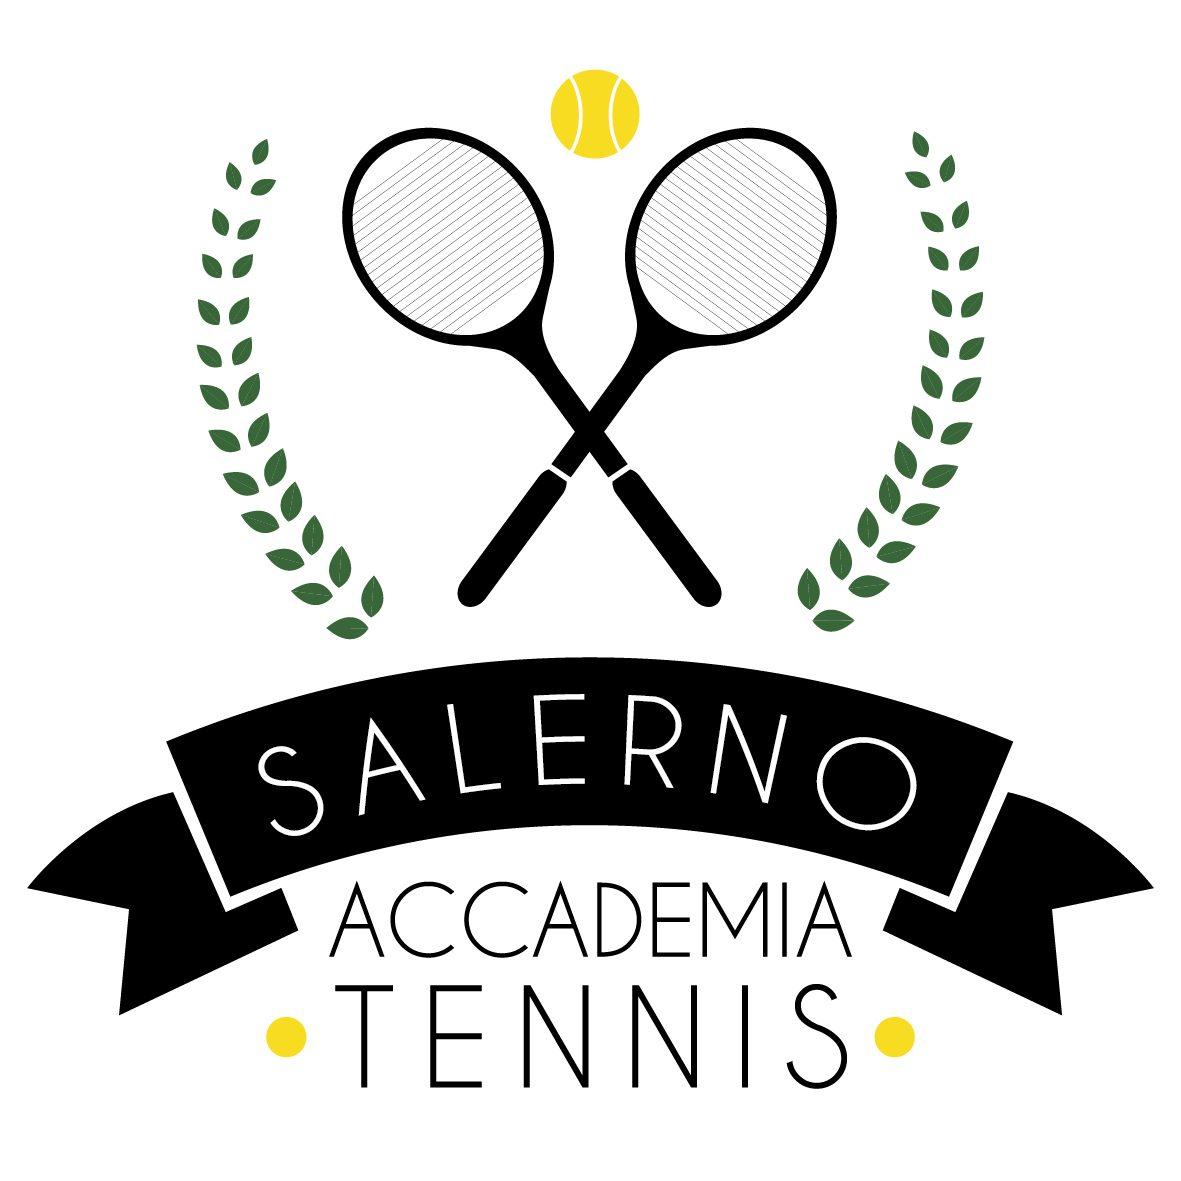 Accademia Tennis Salerno